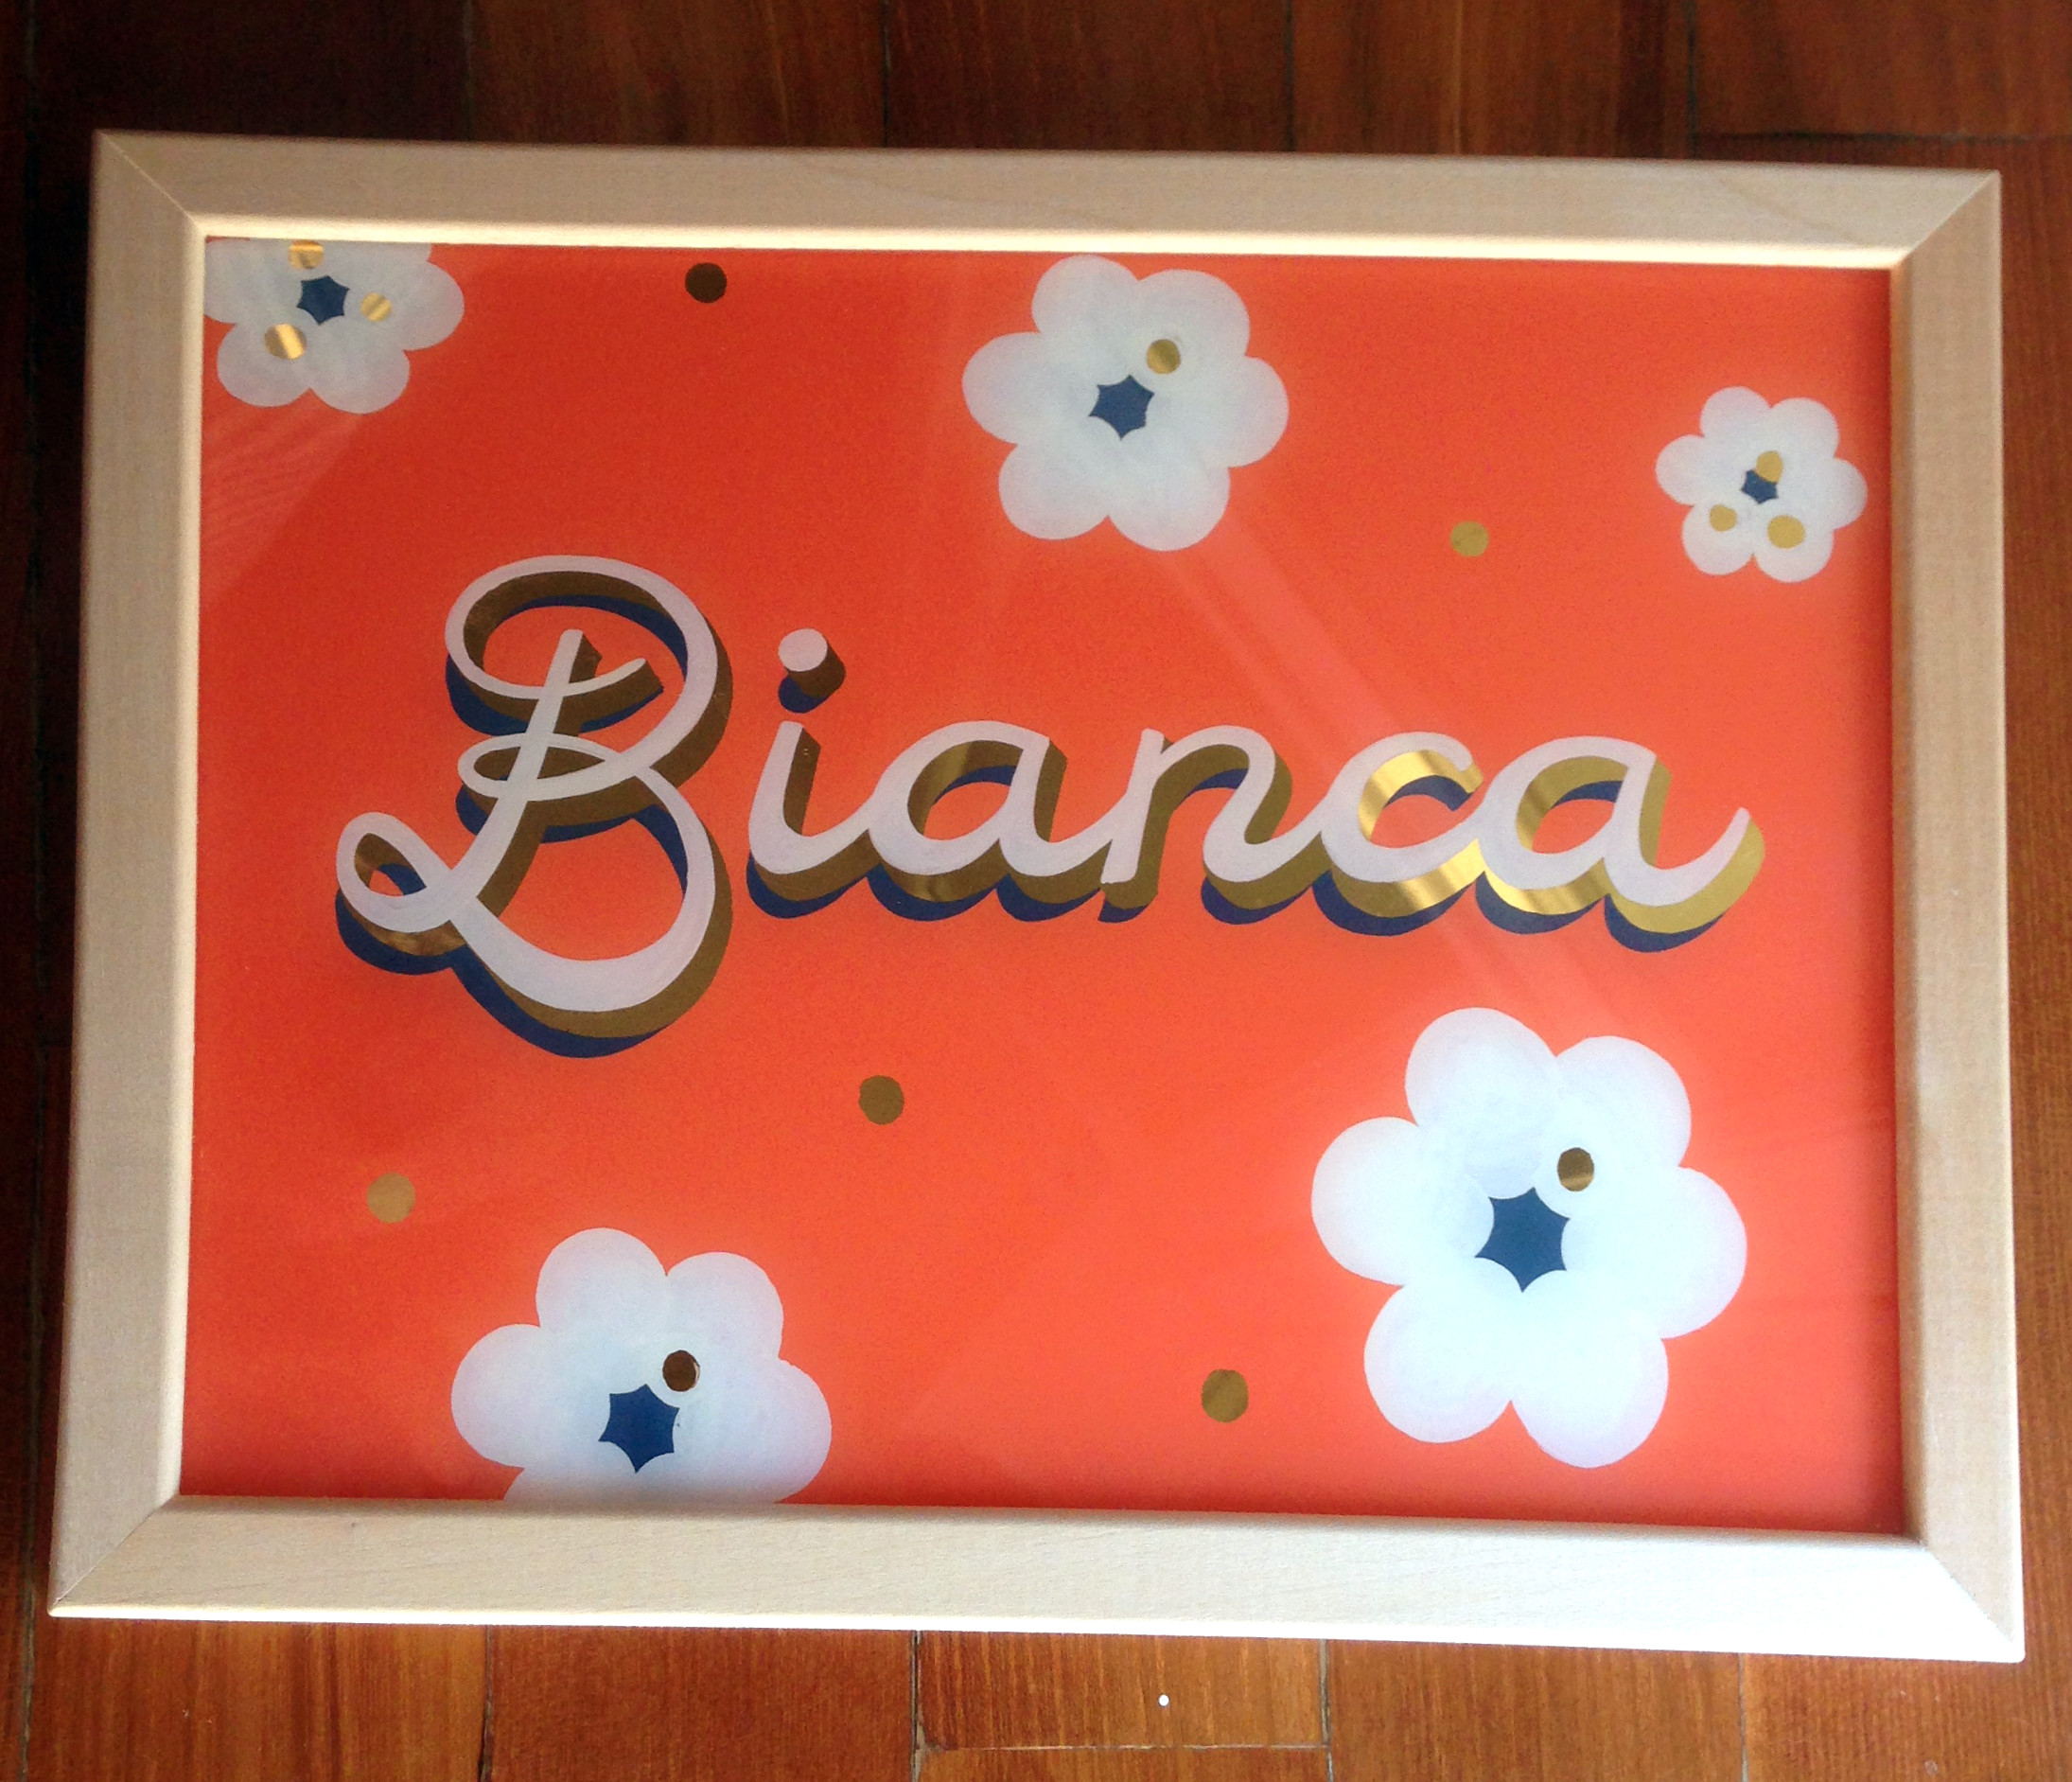 Bianca: Glass Gilding, Lettering, Vergoldung, Hinterglasmalerei, Schriftmalerei